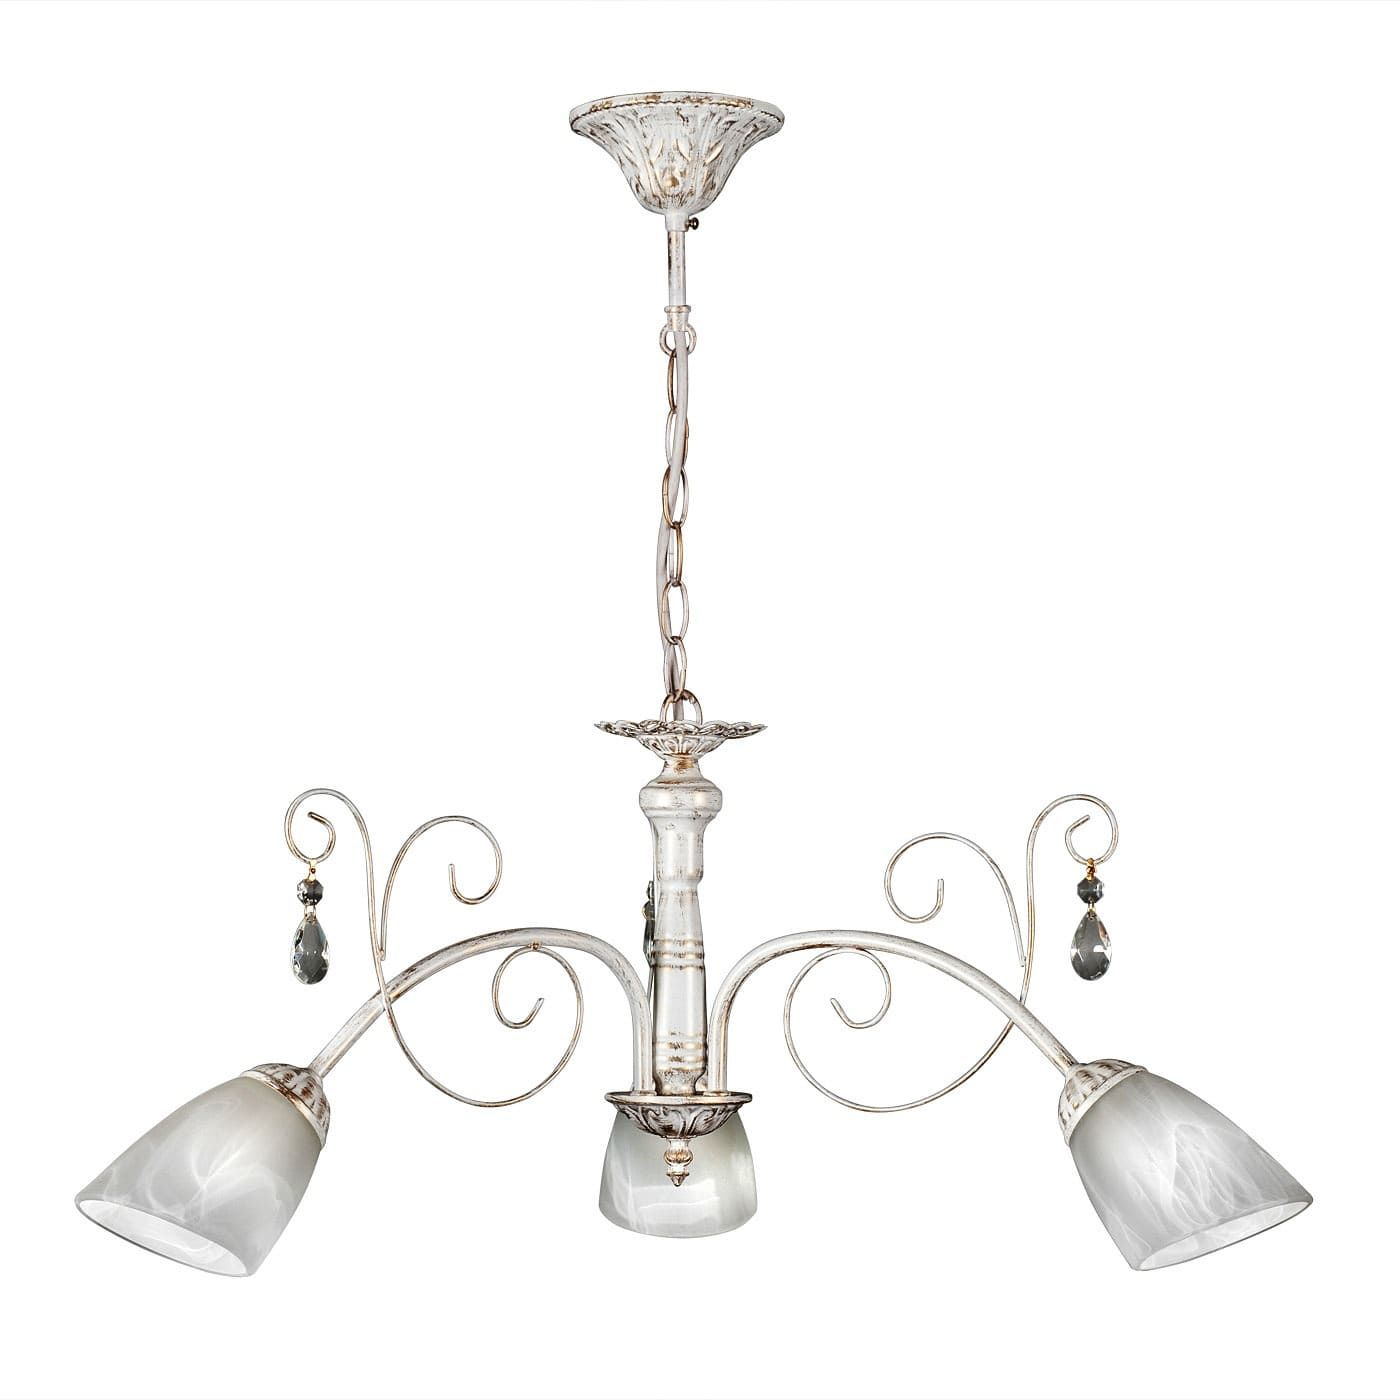 PETRASVET / Pendant chandelier S2020-3, 3xE14 max. 60W